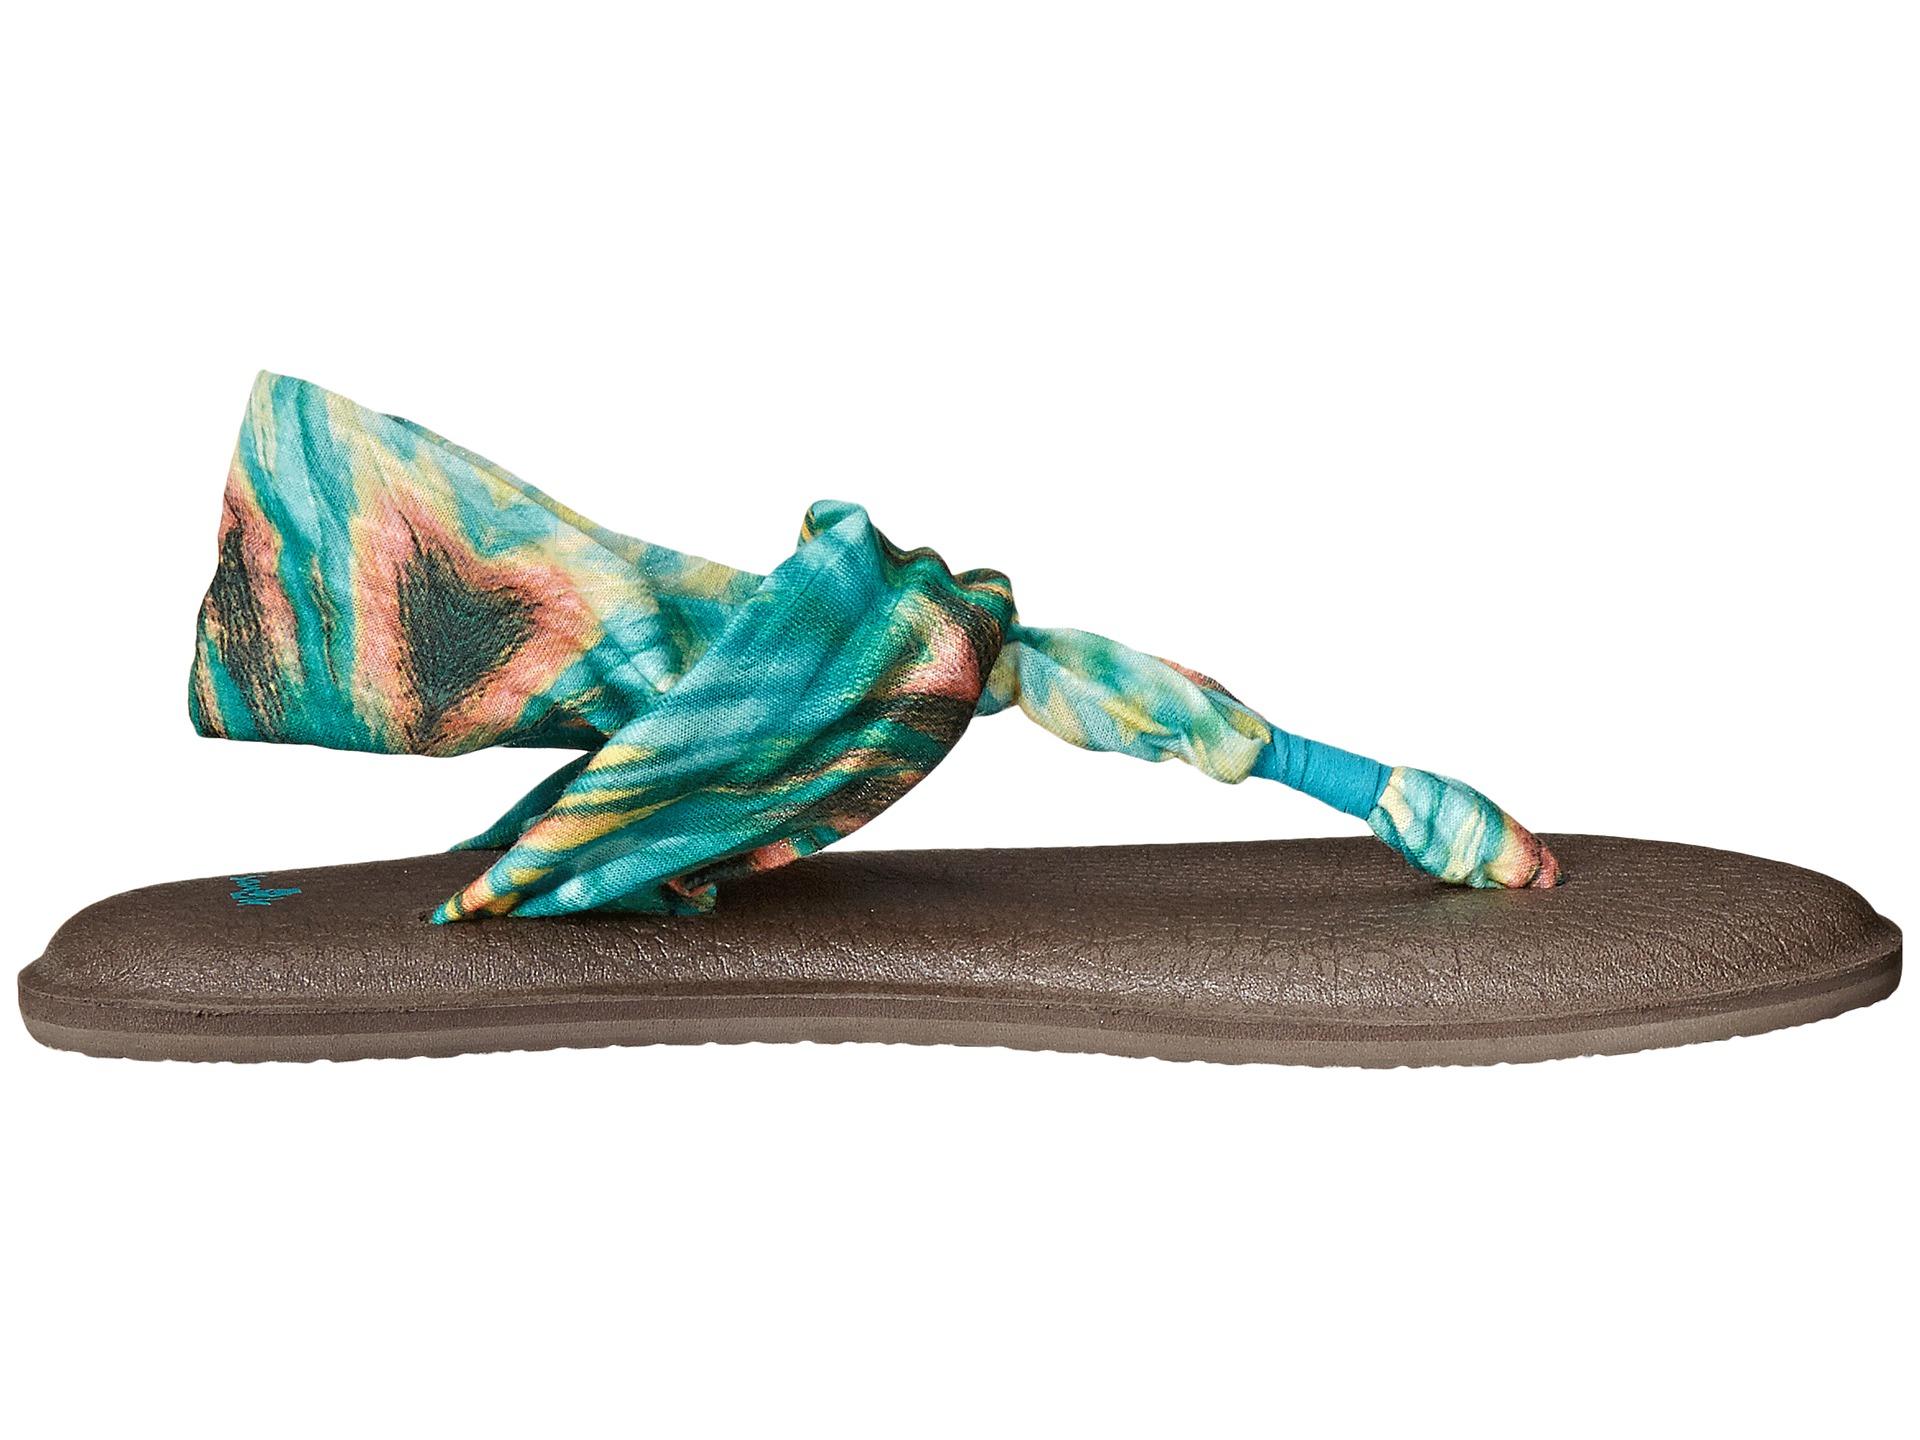 Sanuk Yoga Sling 2 Prints Stretch Knit Sandals vb3pxgOCqW